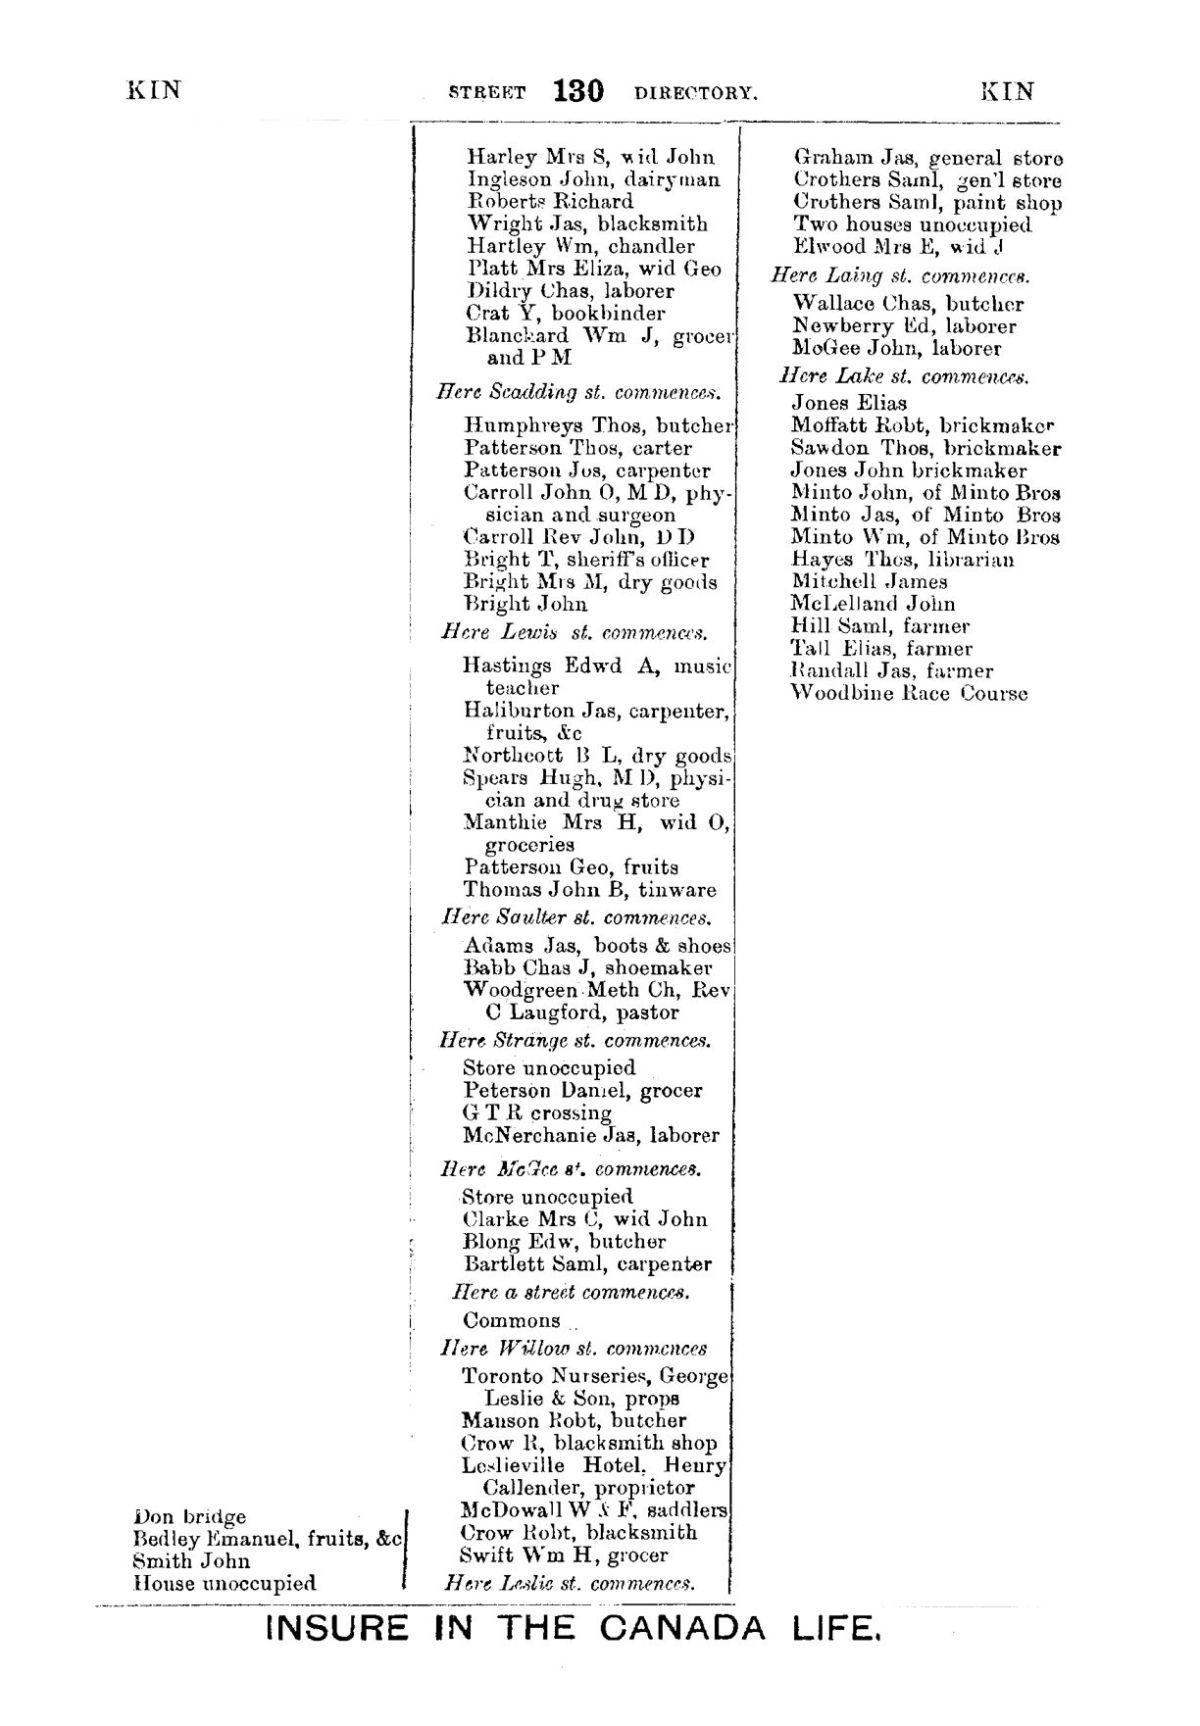 1878 City of Toronto Directory King St